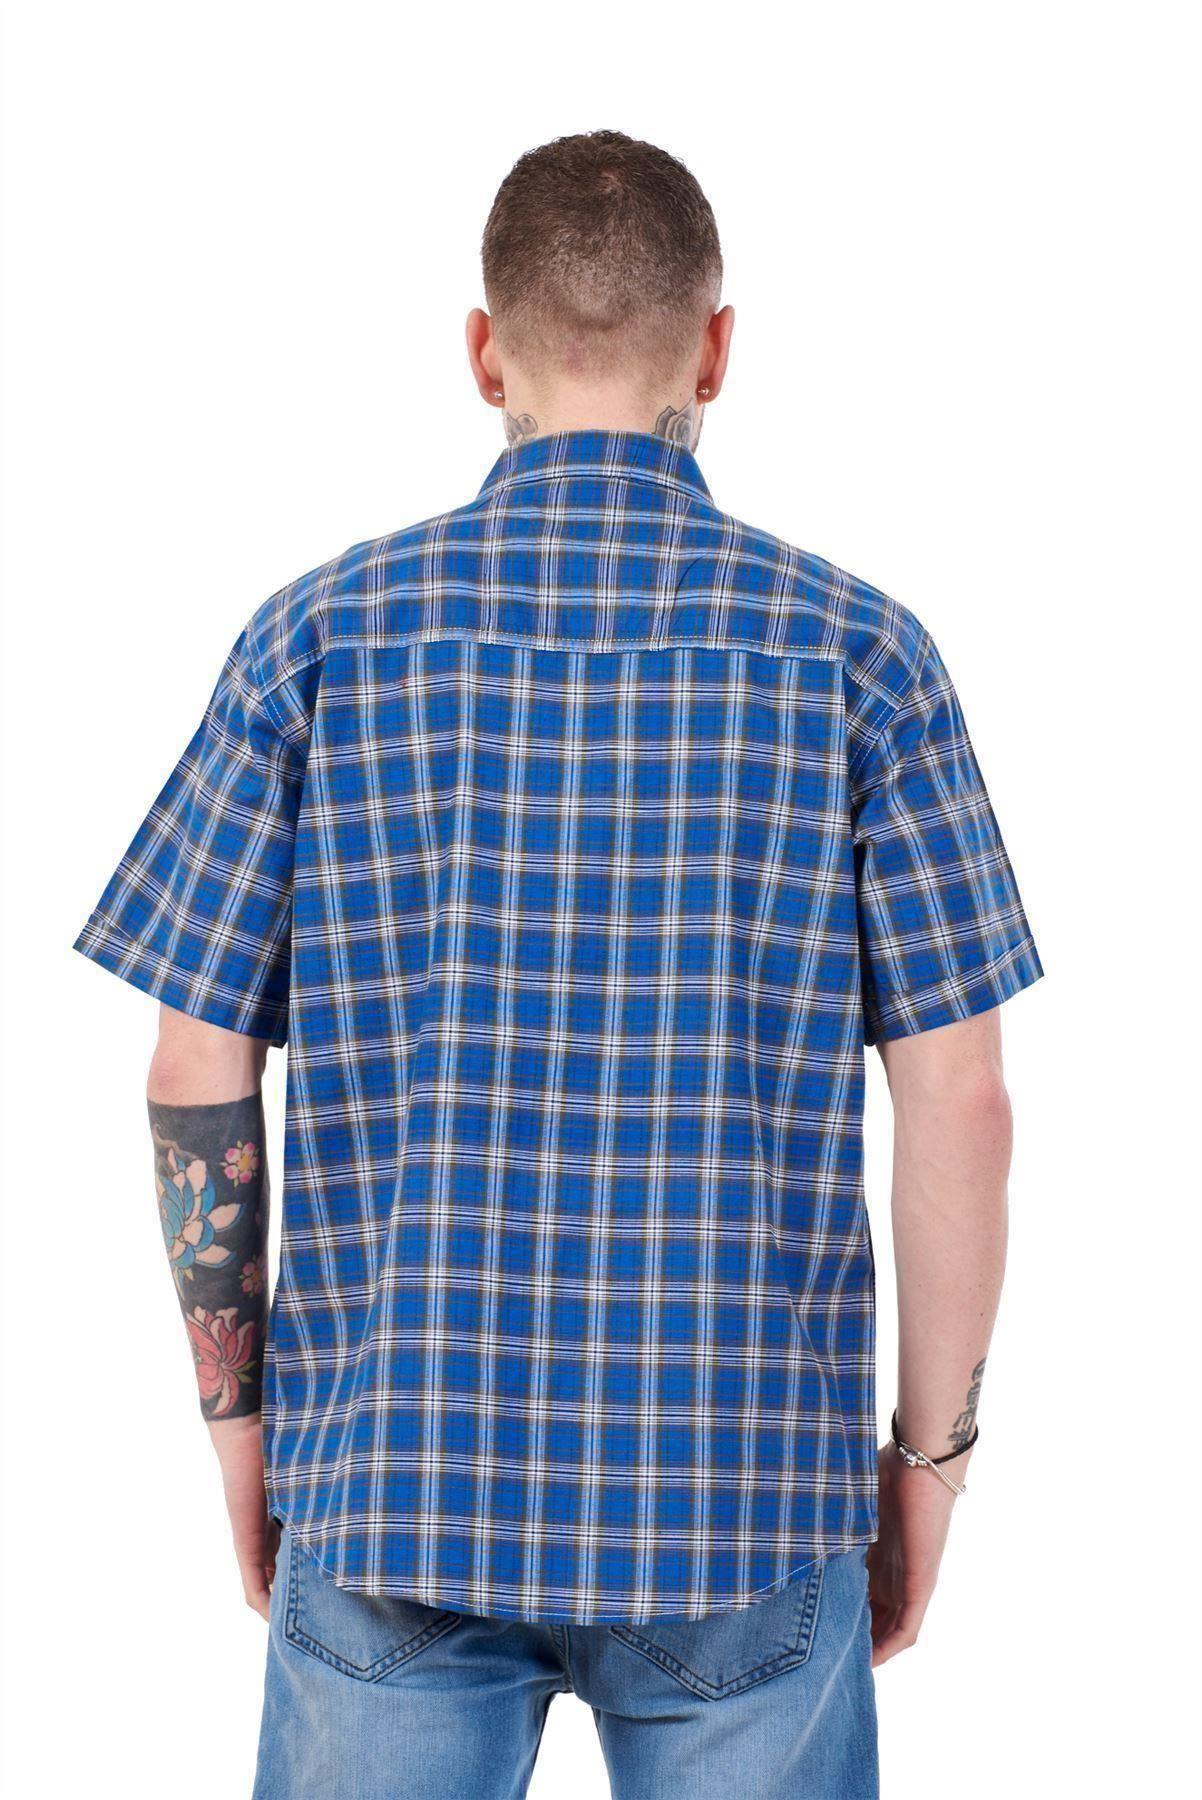 Mens-Regular-Big-Size-Shirts-Checked-Cotton-Blend-Casual-Short-Sleeve-Blue-M-5XL thumbnail 23